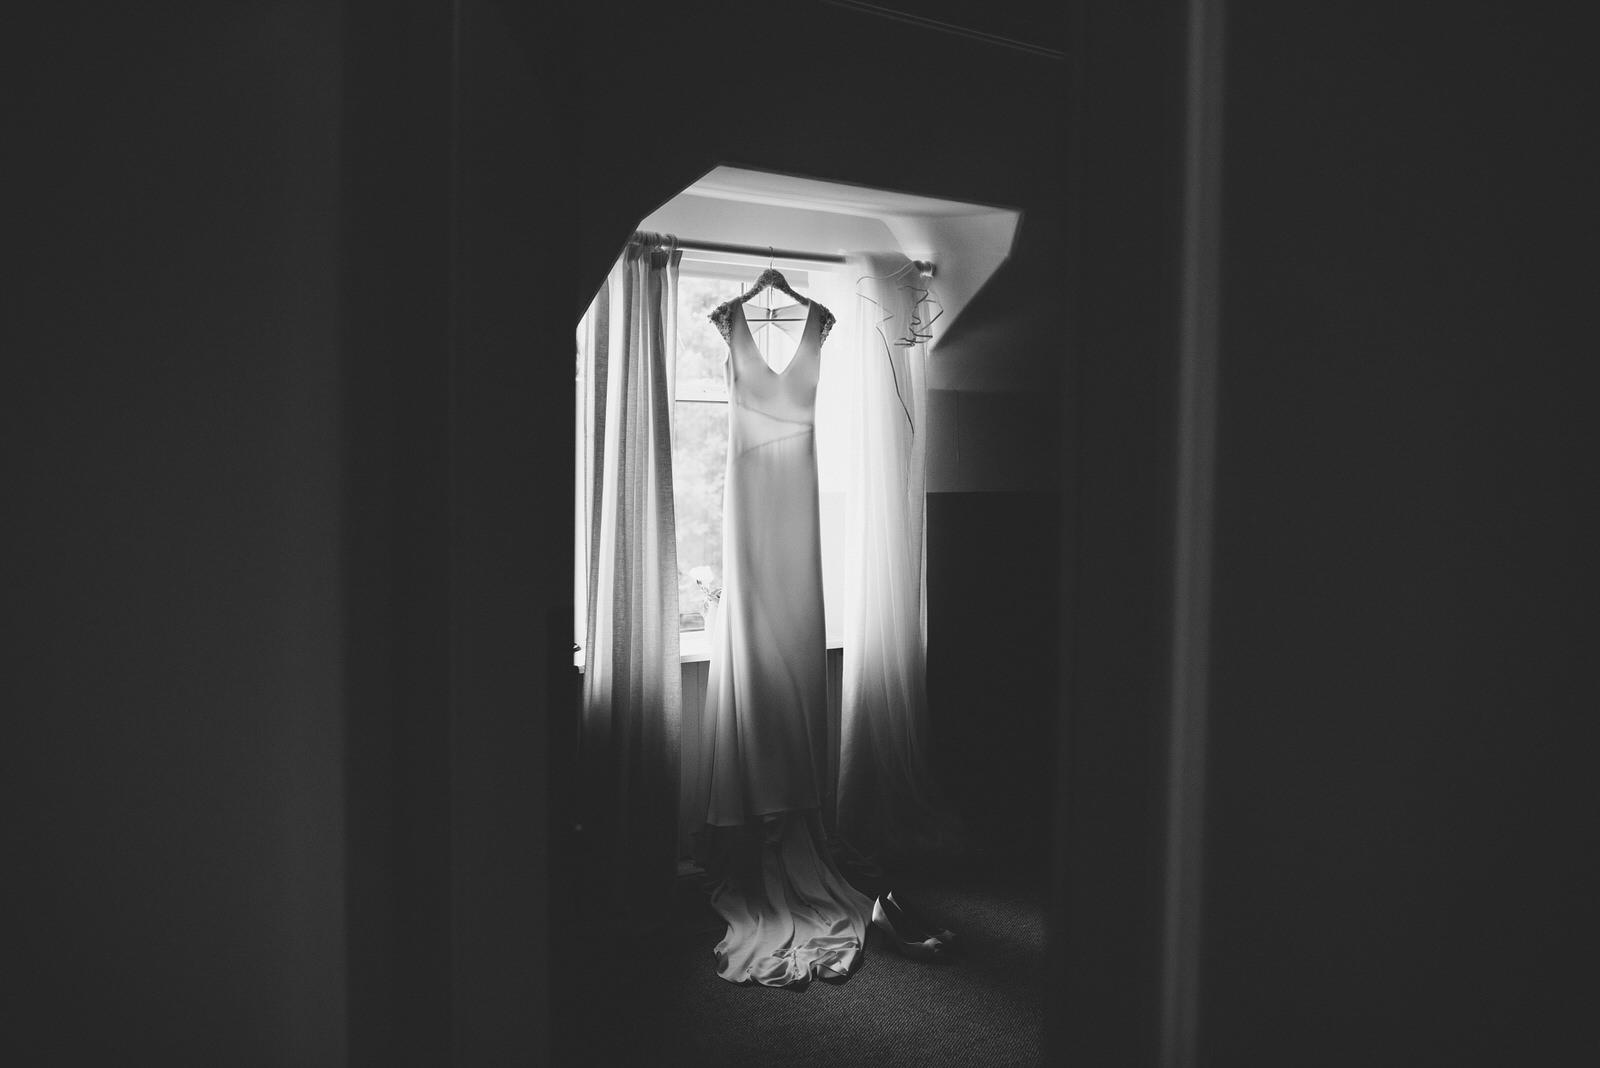 009-GUARDSWELL-FARM-WEDDING-ALTERNATIVE-SCOTTISH-WEDDING-PHOTOGRAPHER-SCOTTISH-WEDDING-DESTINATION-WEDDING-PHOTOGRAPHER.JPG